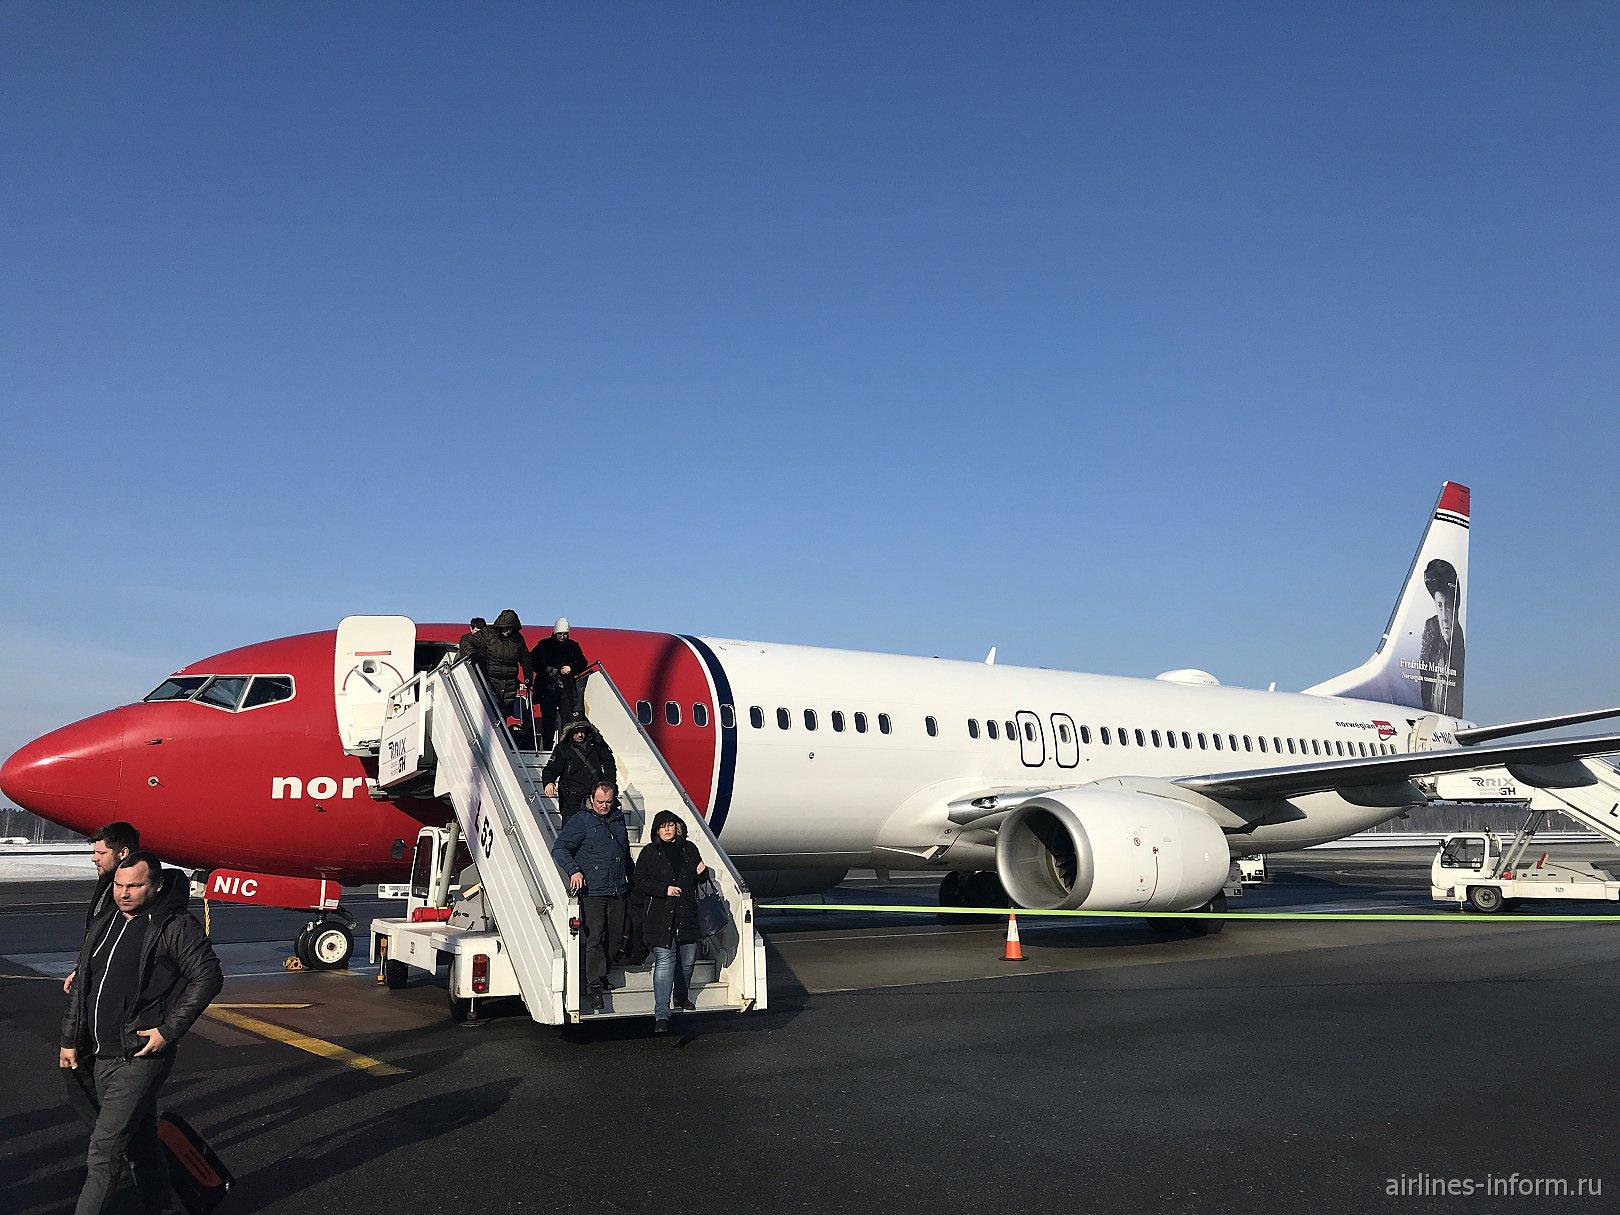 Стокгольм (ARN) - Рига (RIX) на Boeing 737-800 авиакомпании Norwegian Air Shuttle (90 фото)